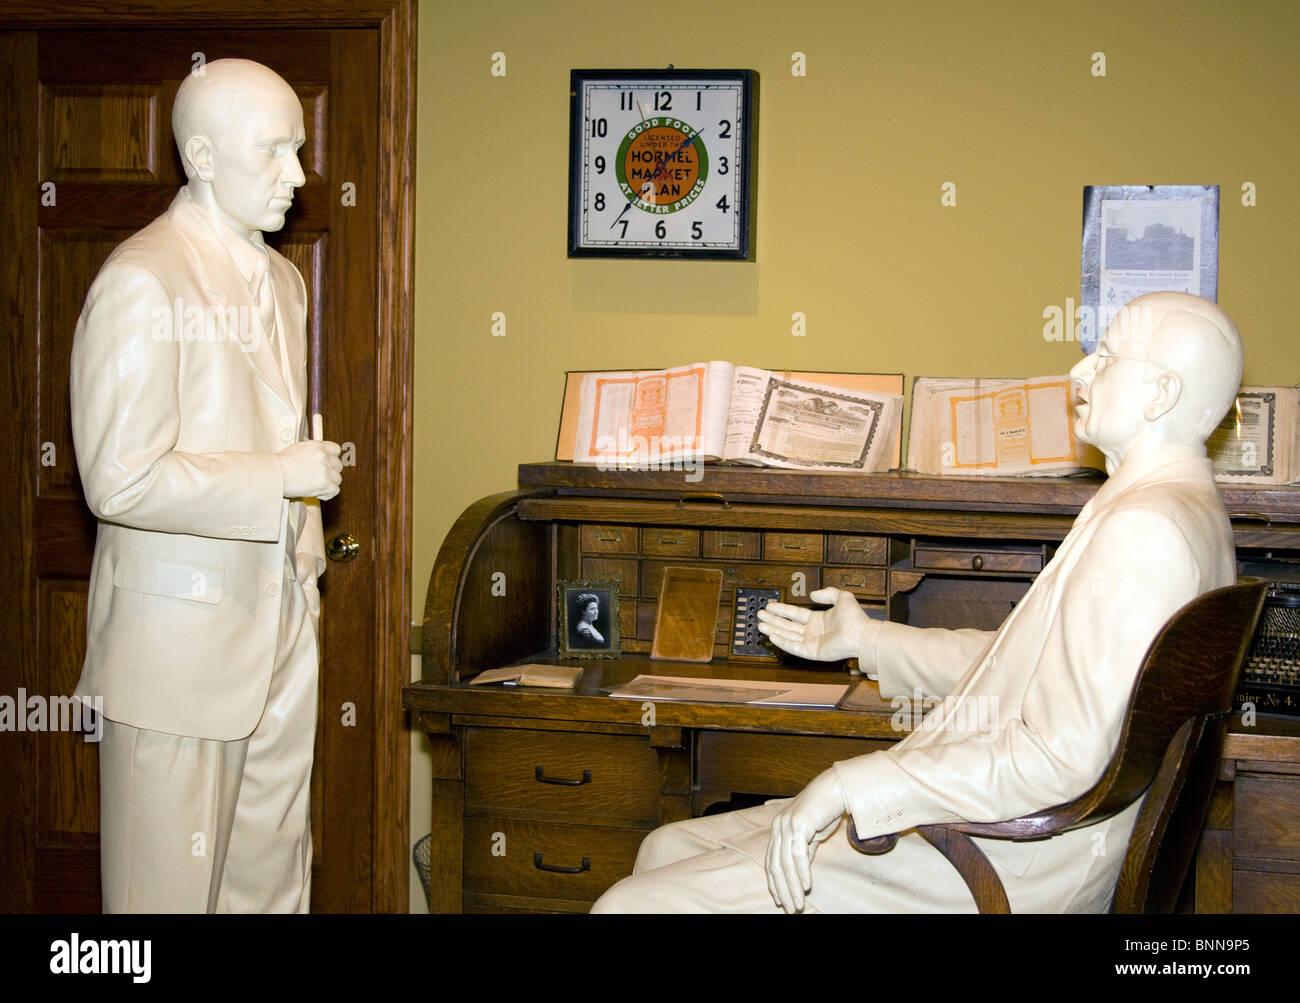 Spam Museum in Austin Minnesota - Stock Image